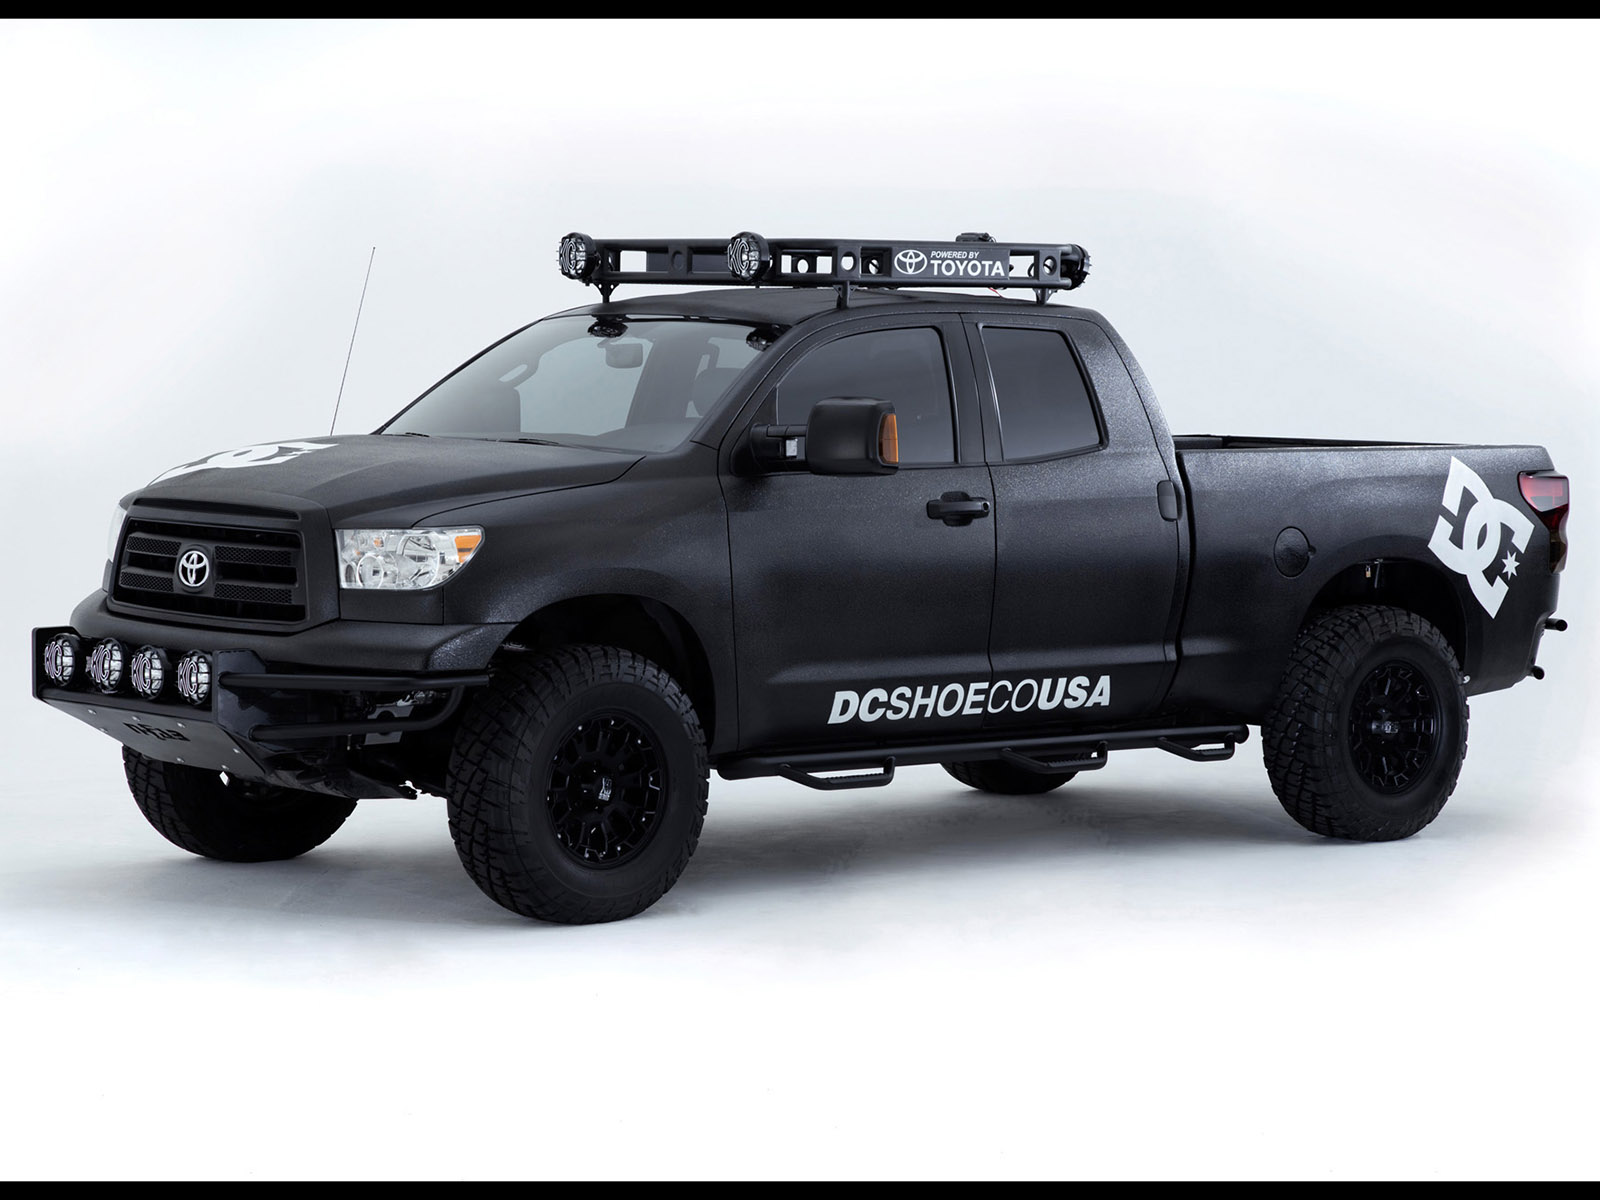 West Coast Customs Cars For Sale >> West Coast Customs Toyota Tundra Ultimate Motocross Truck